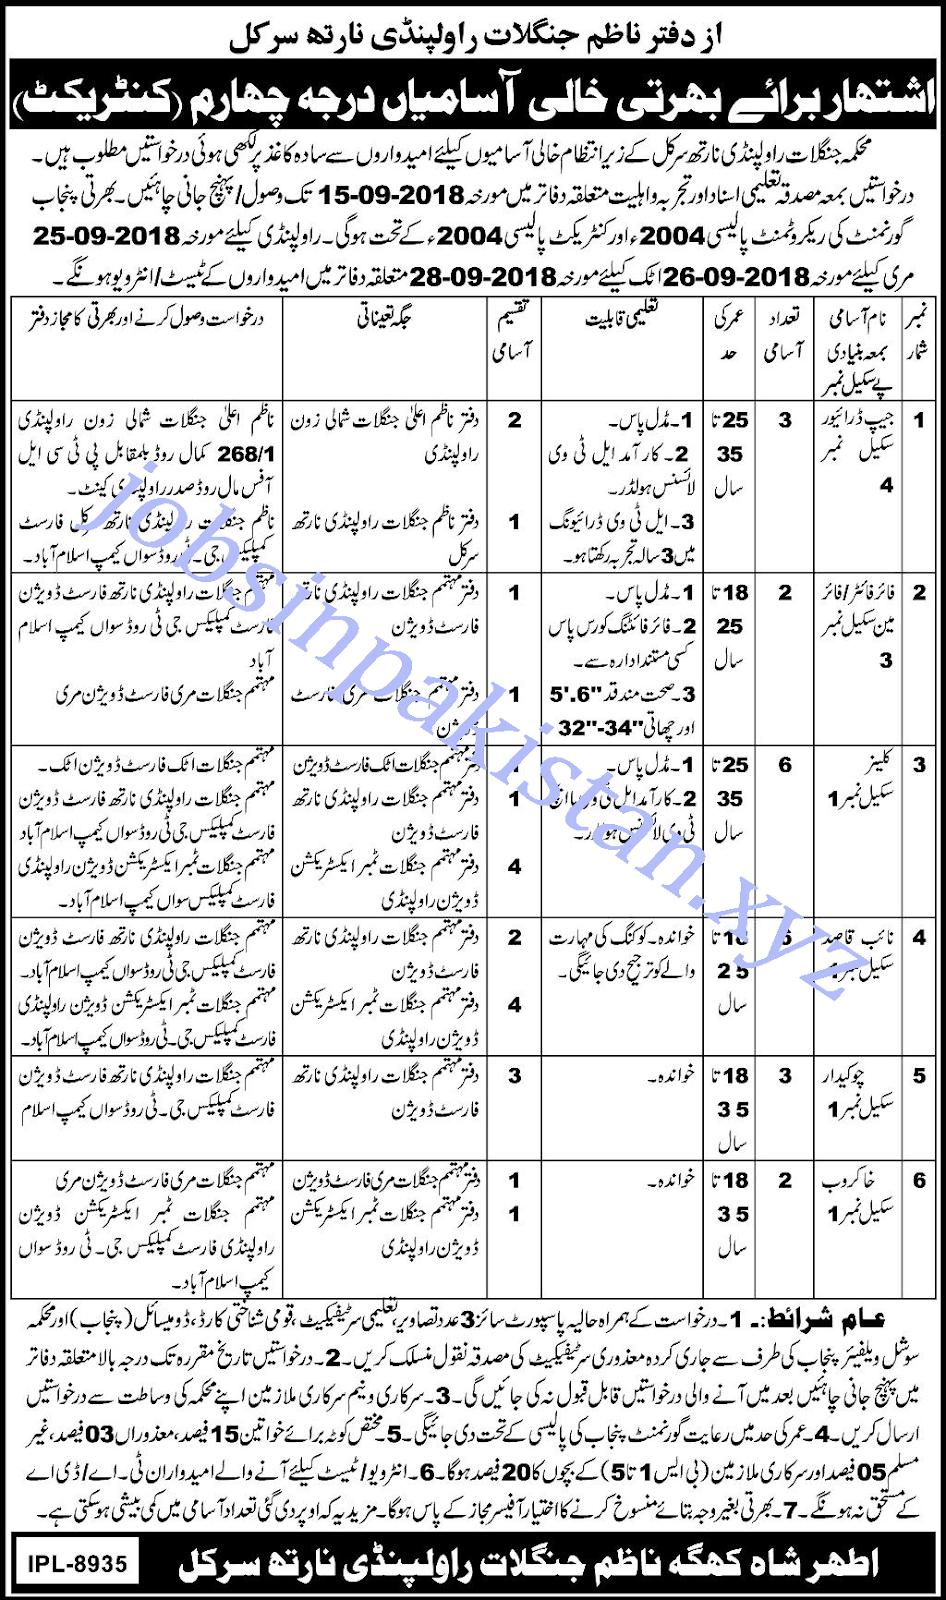 https://www.jobsinpakistan.xyz/2018/09/forest-department-jobs-2018.html